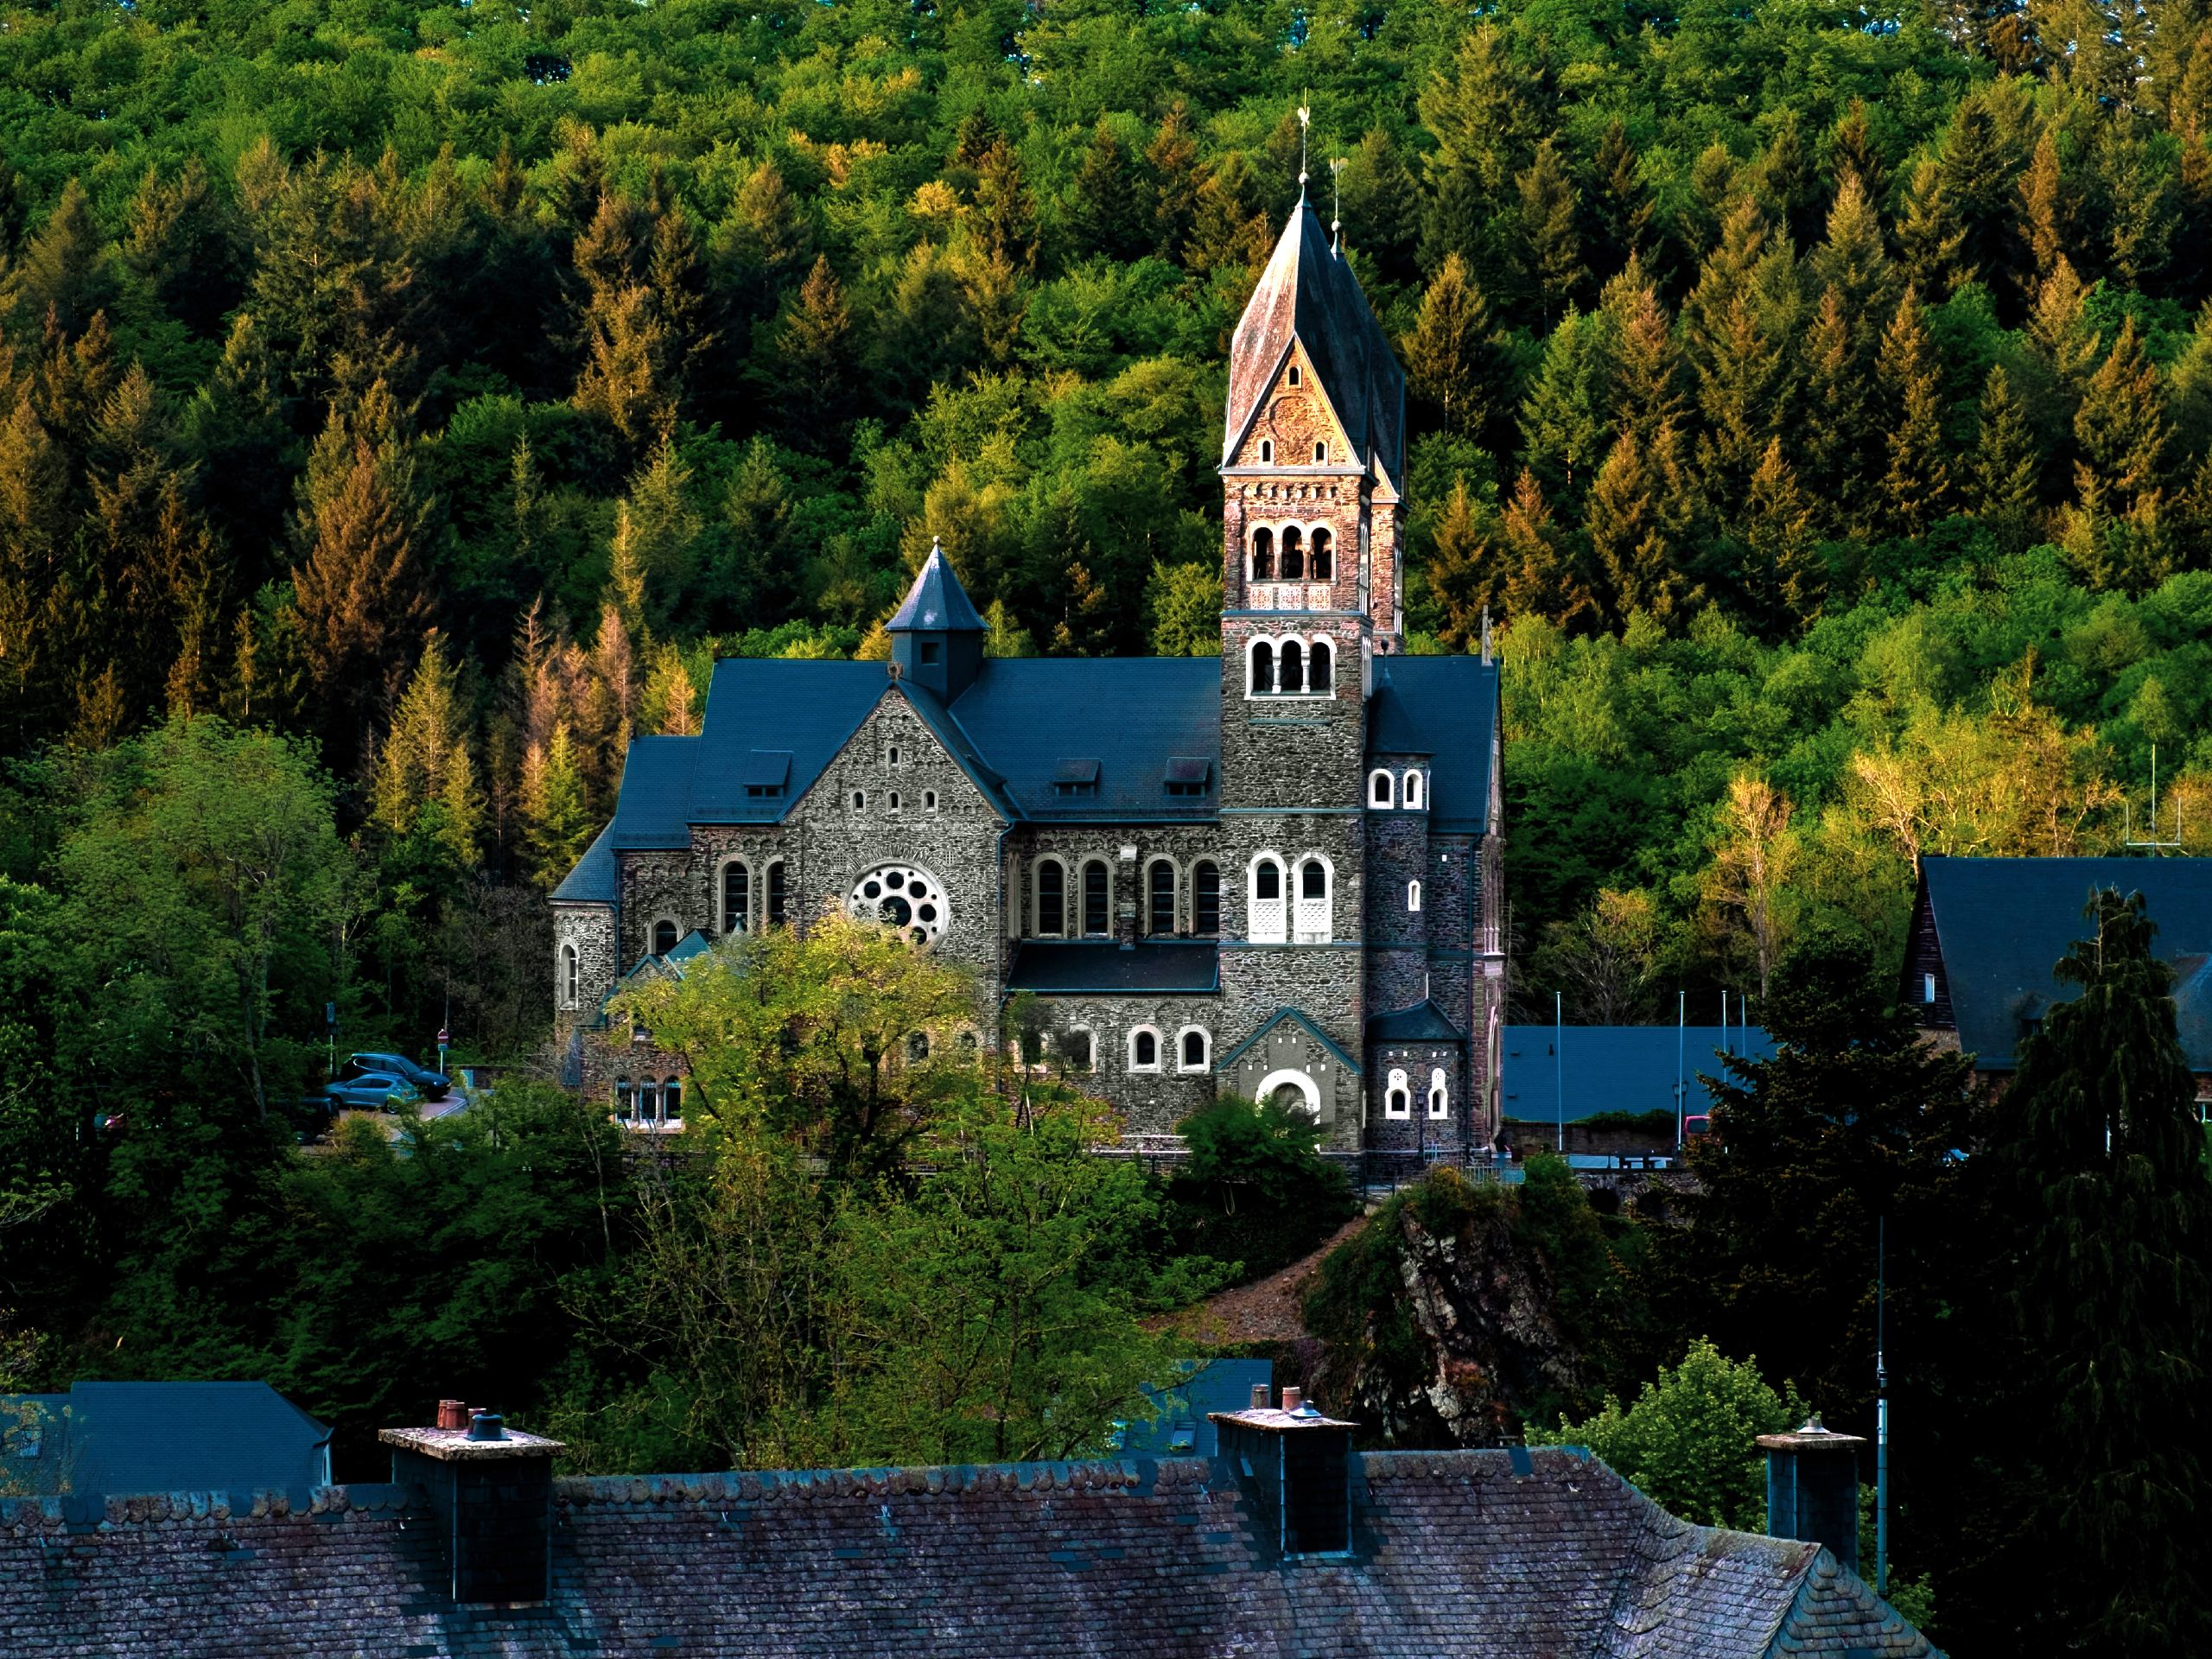 Church seen on self-guided biking tour in Benilux